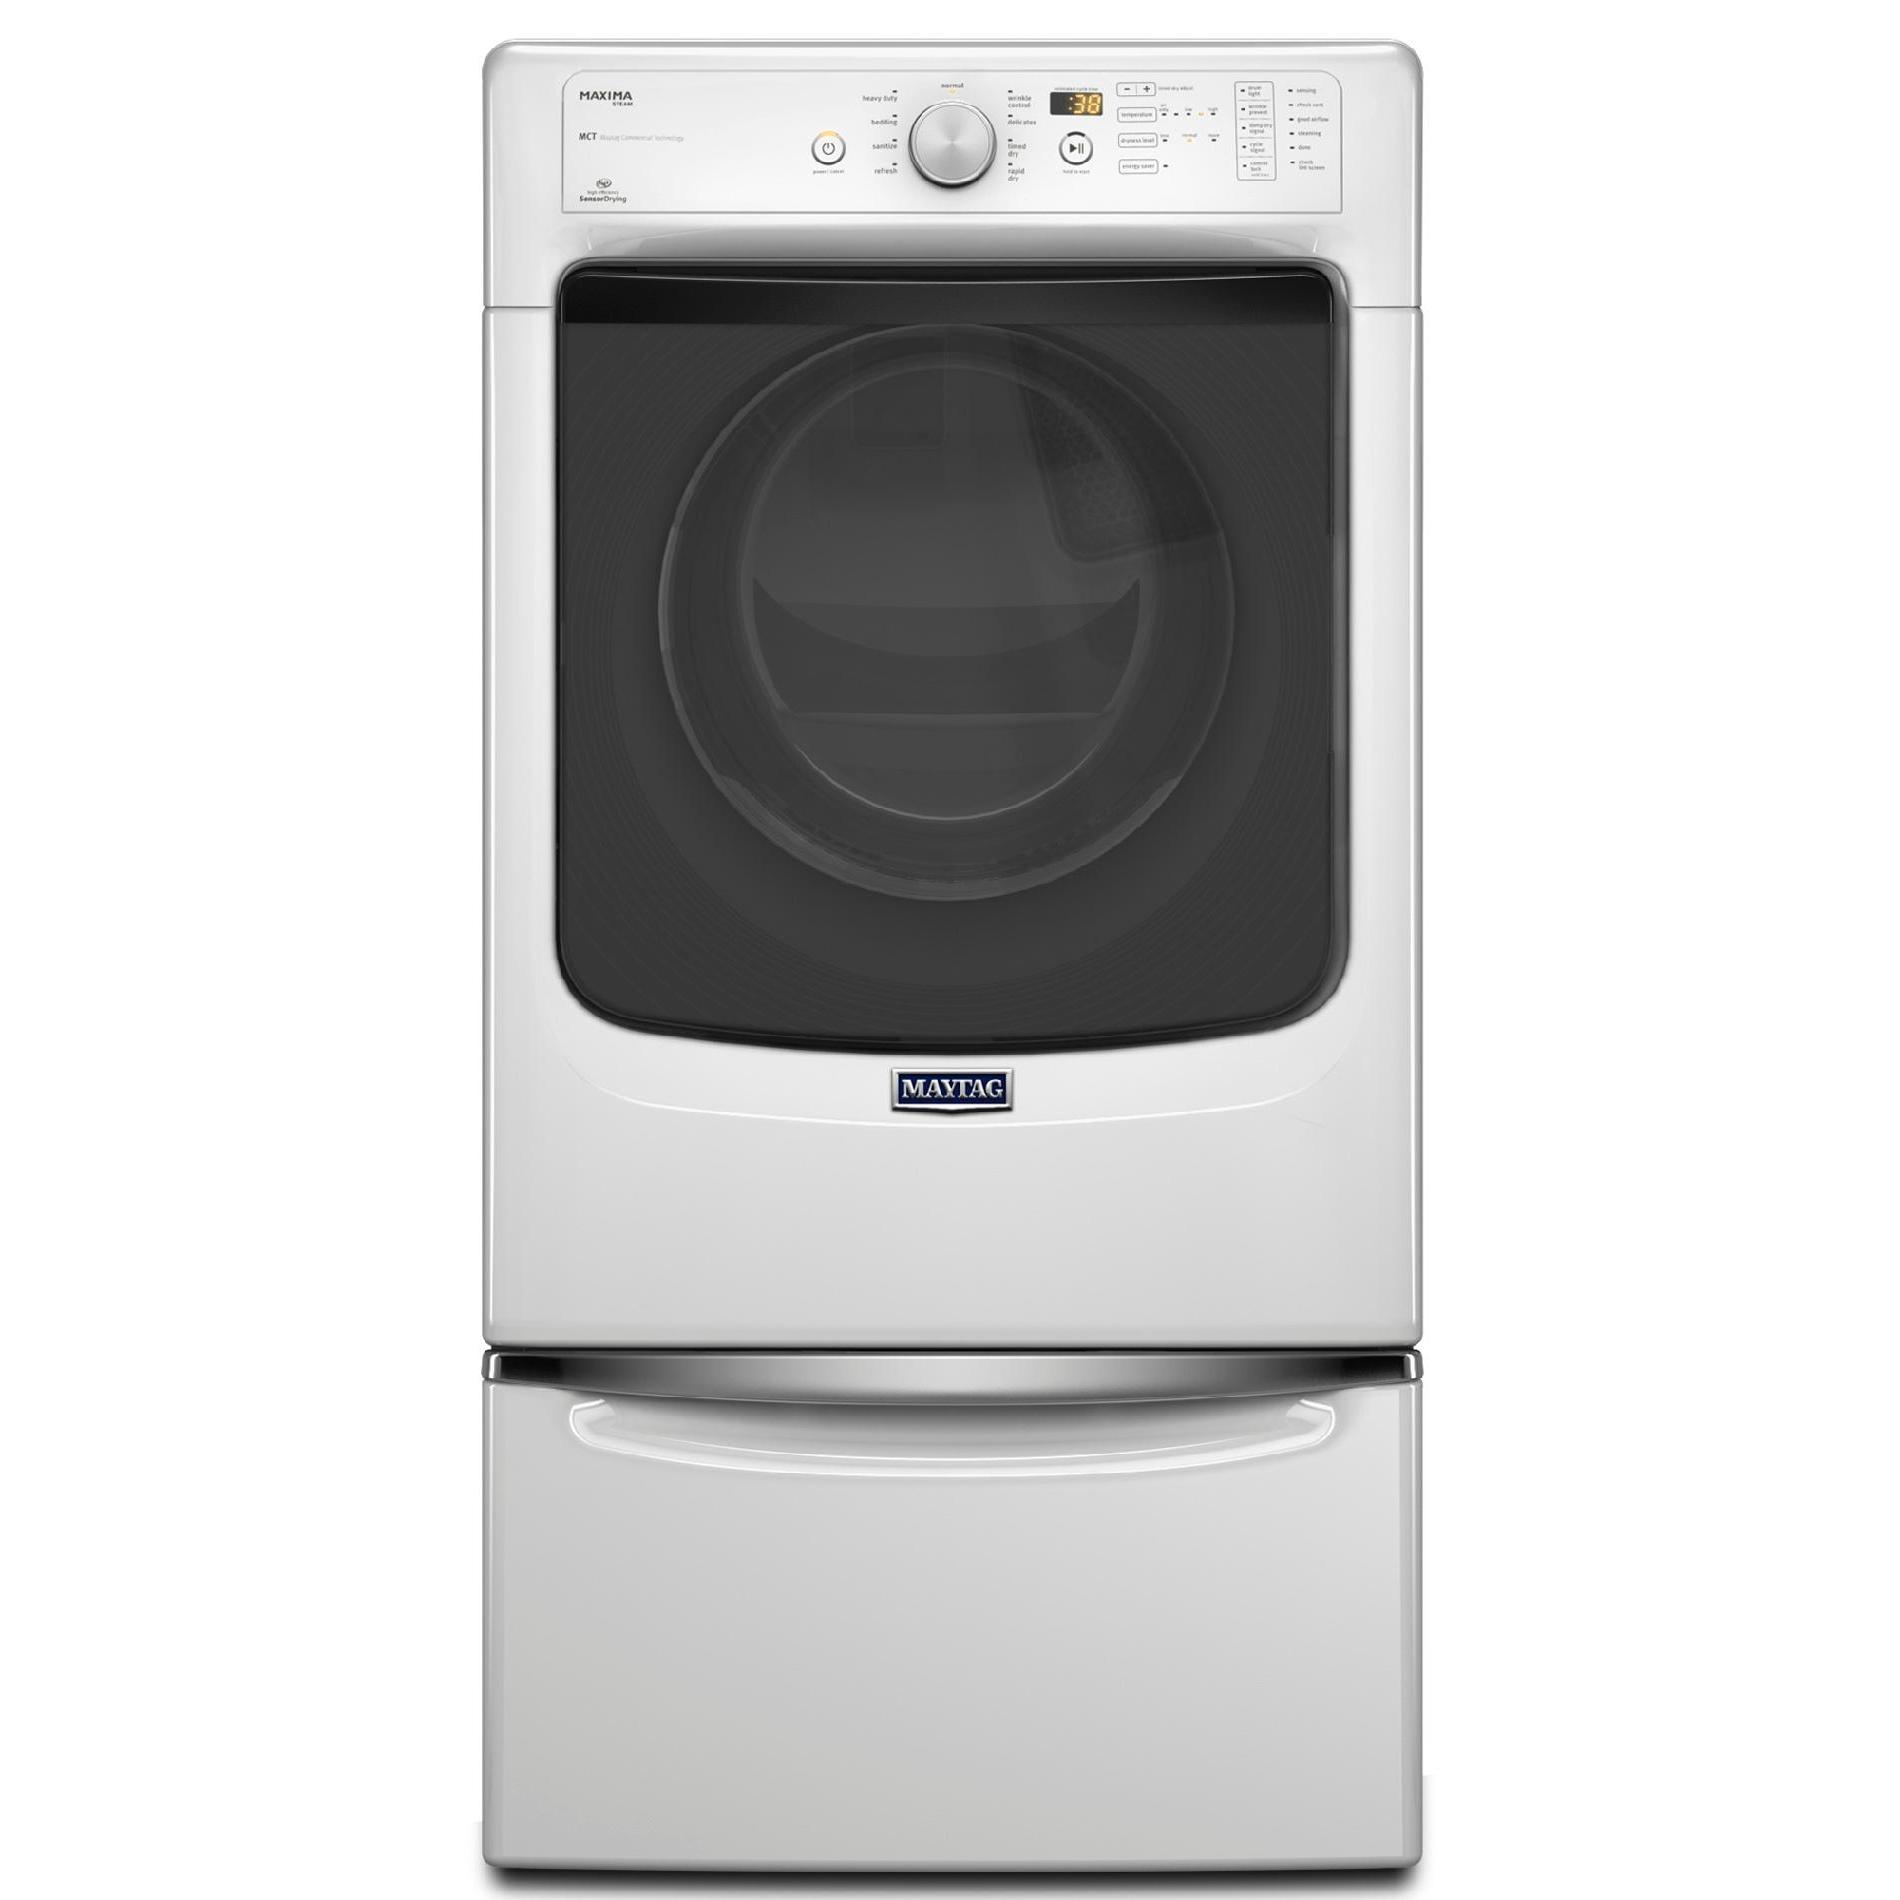 Maytag MGD5100DW 7.4 cu. ft. Maxima® Gas Dryer w/ Steam Cycle - White